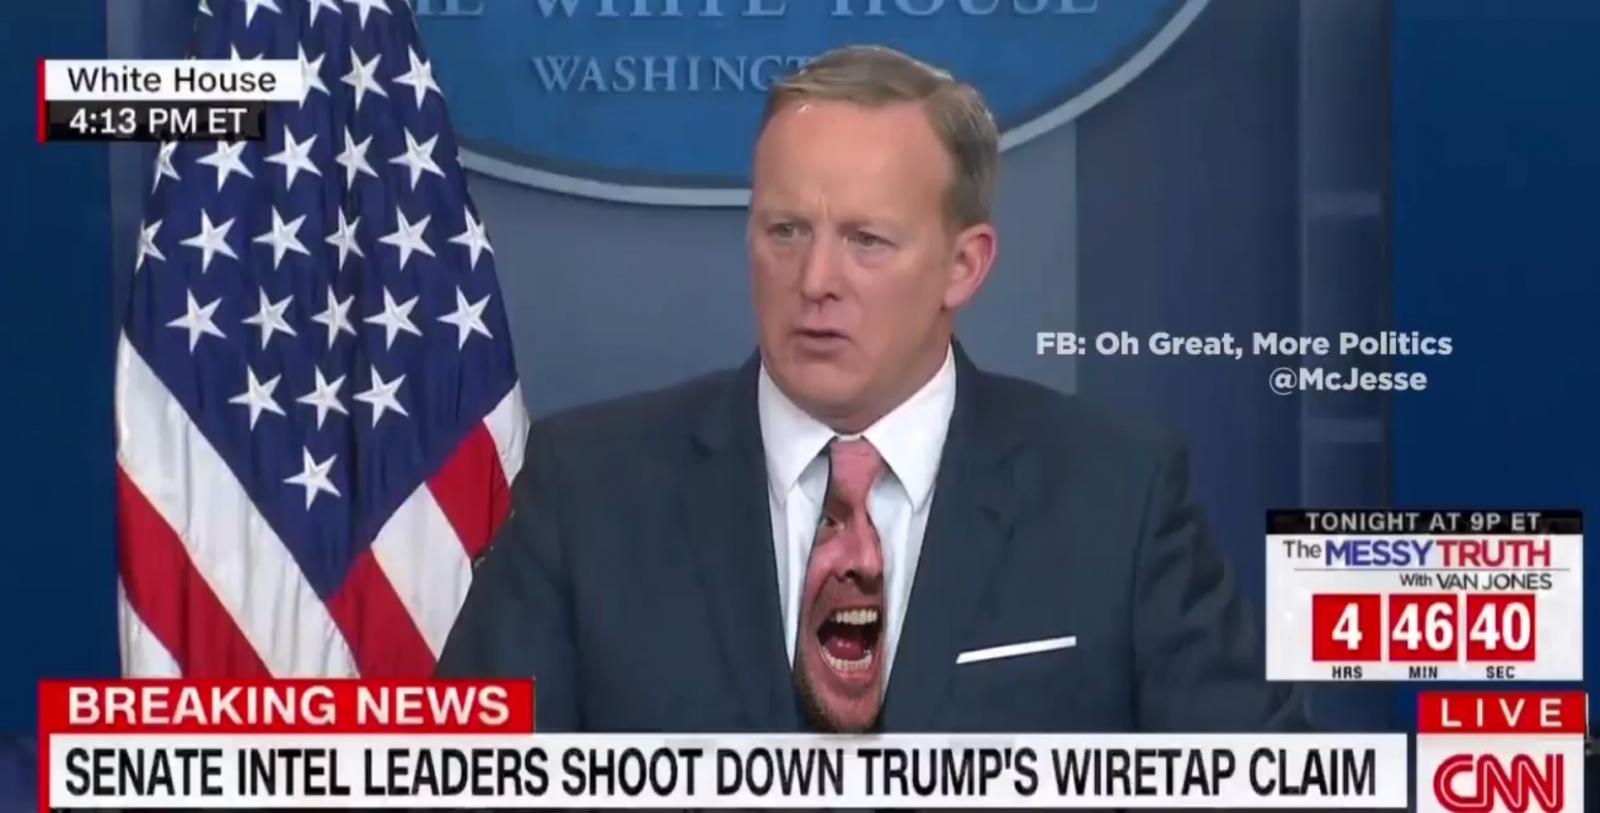 Sean Spicer green screen tie